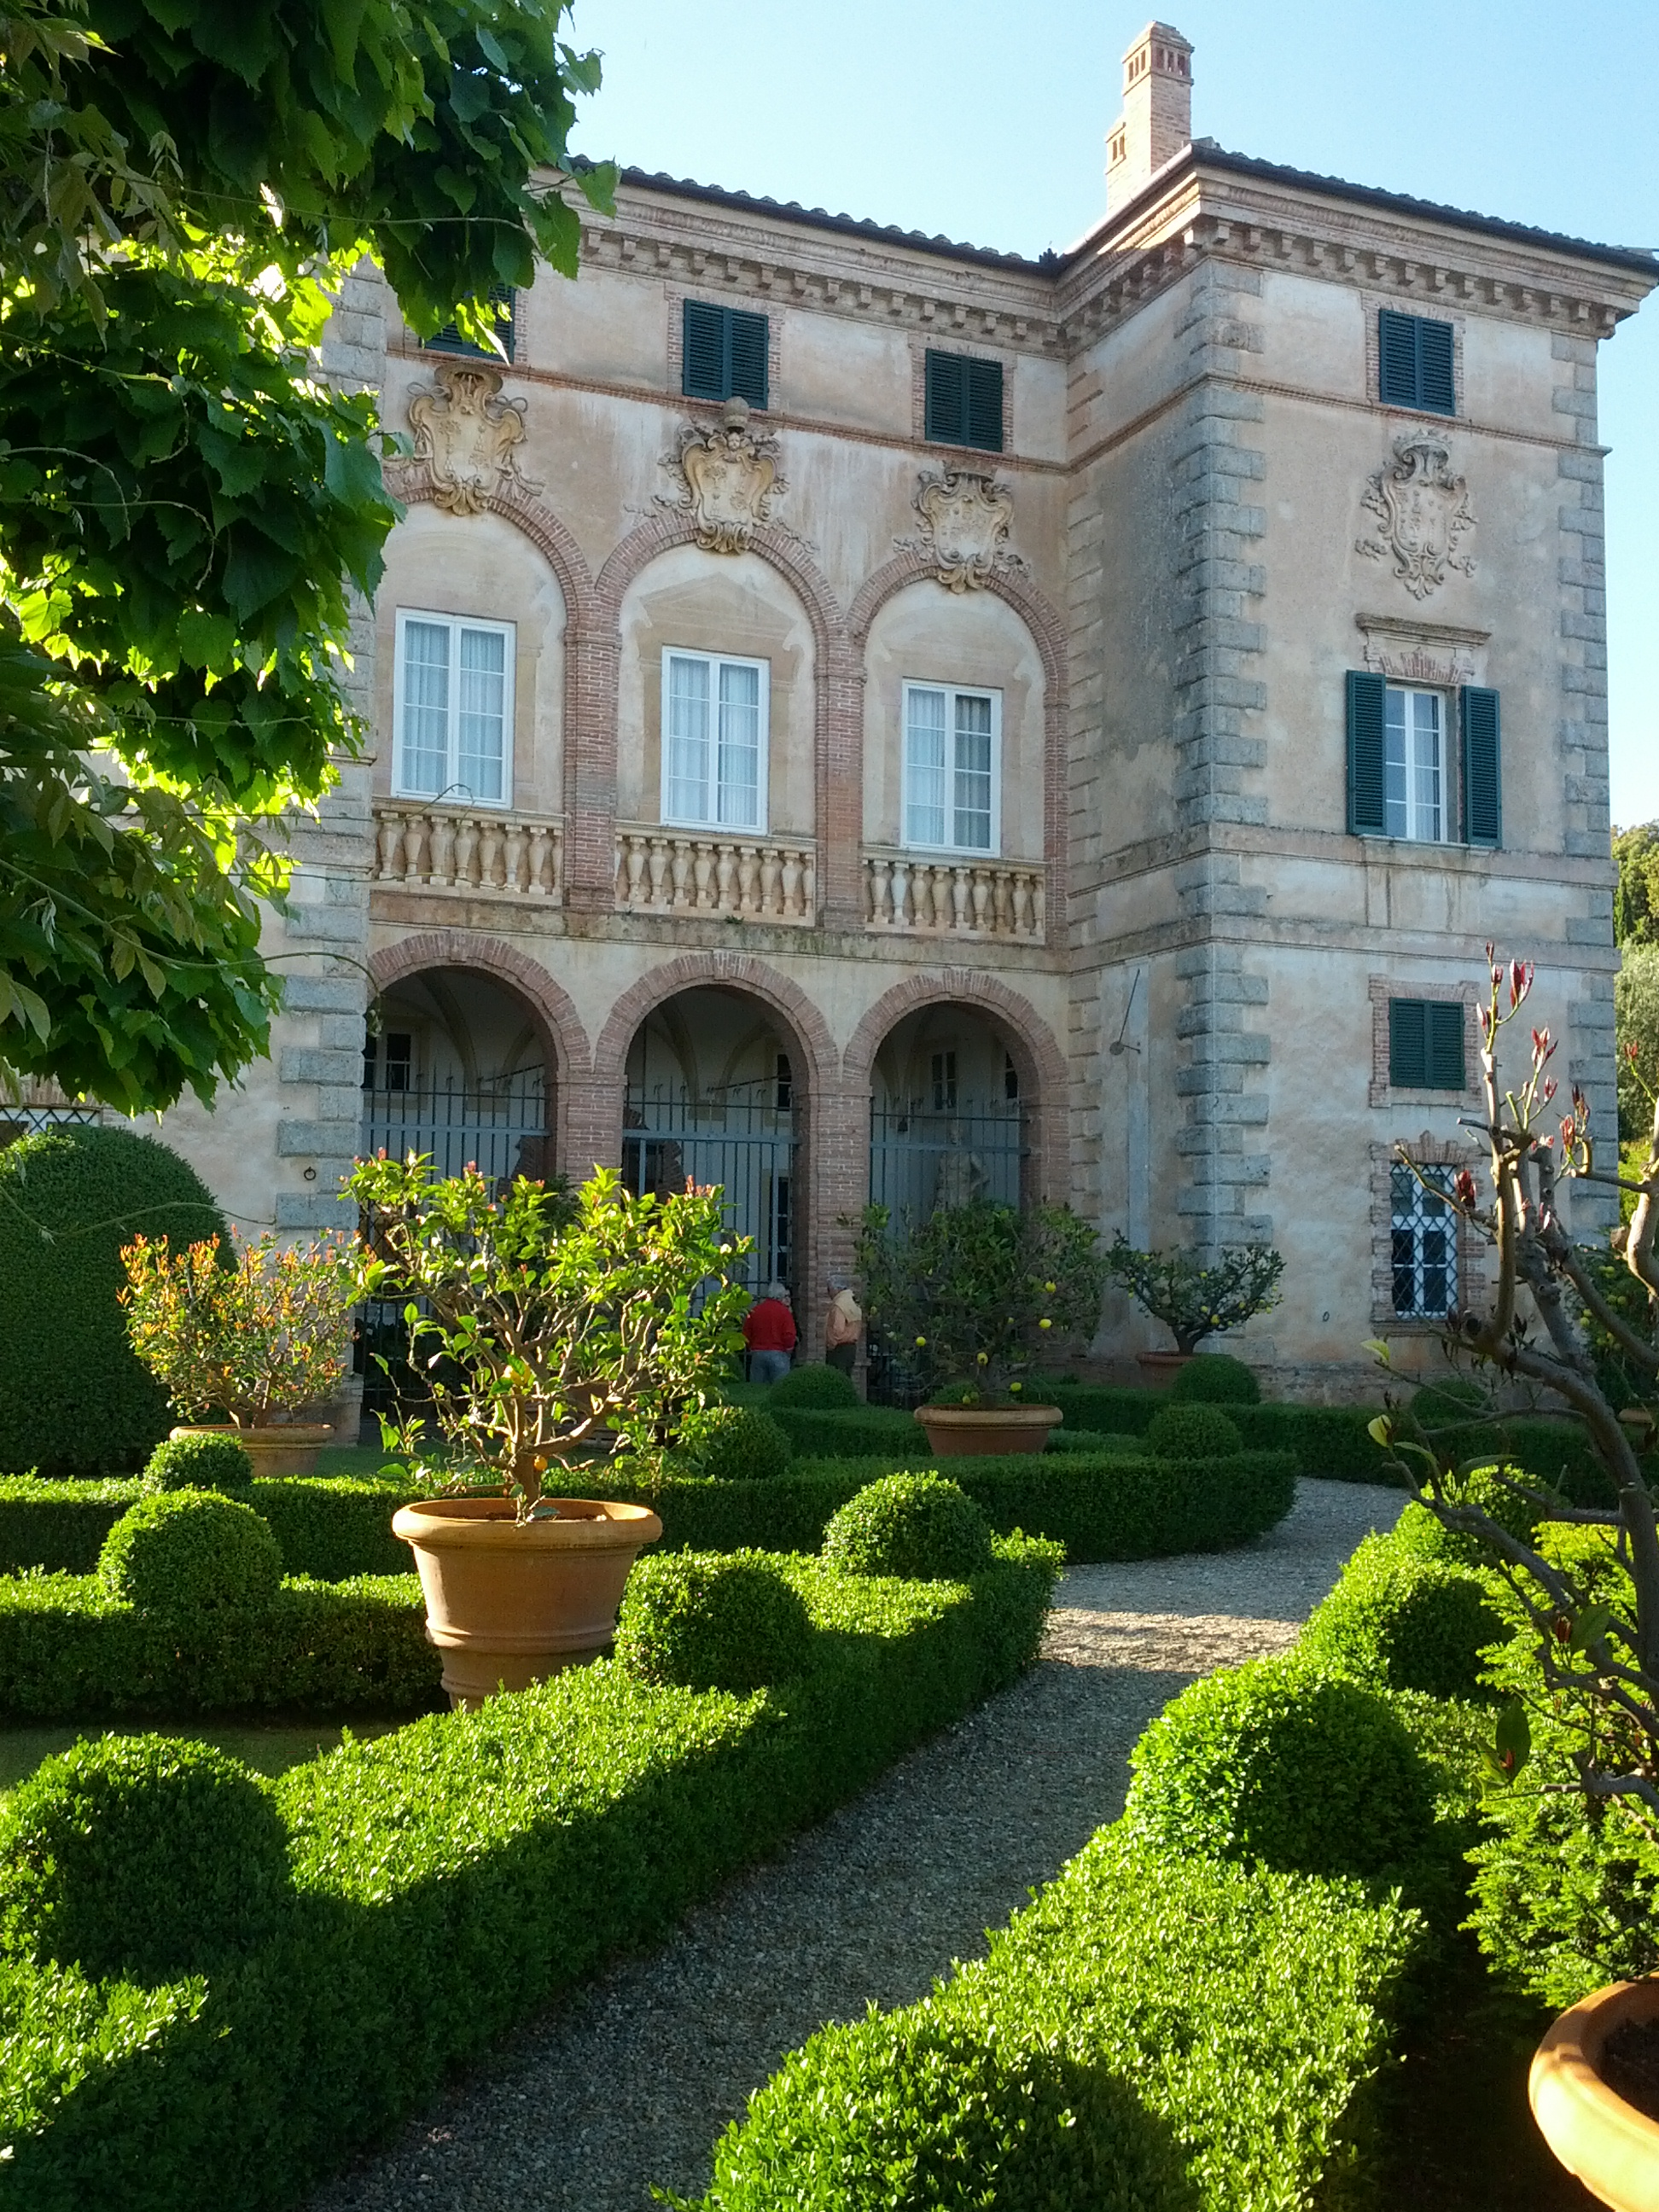 Villa cetinale, veduta.jpg